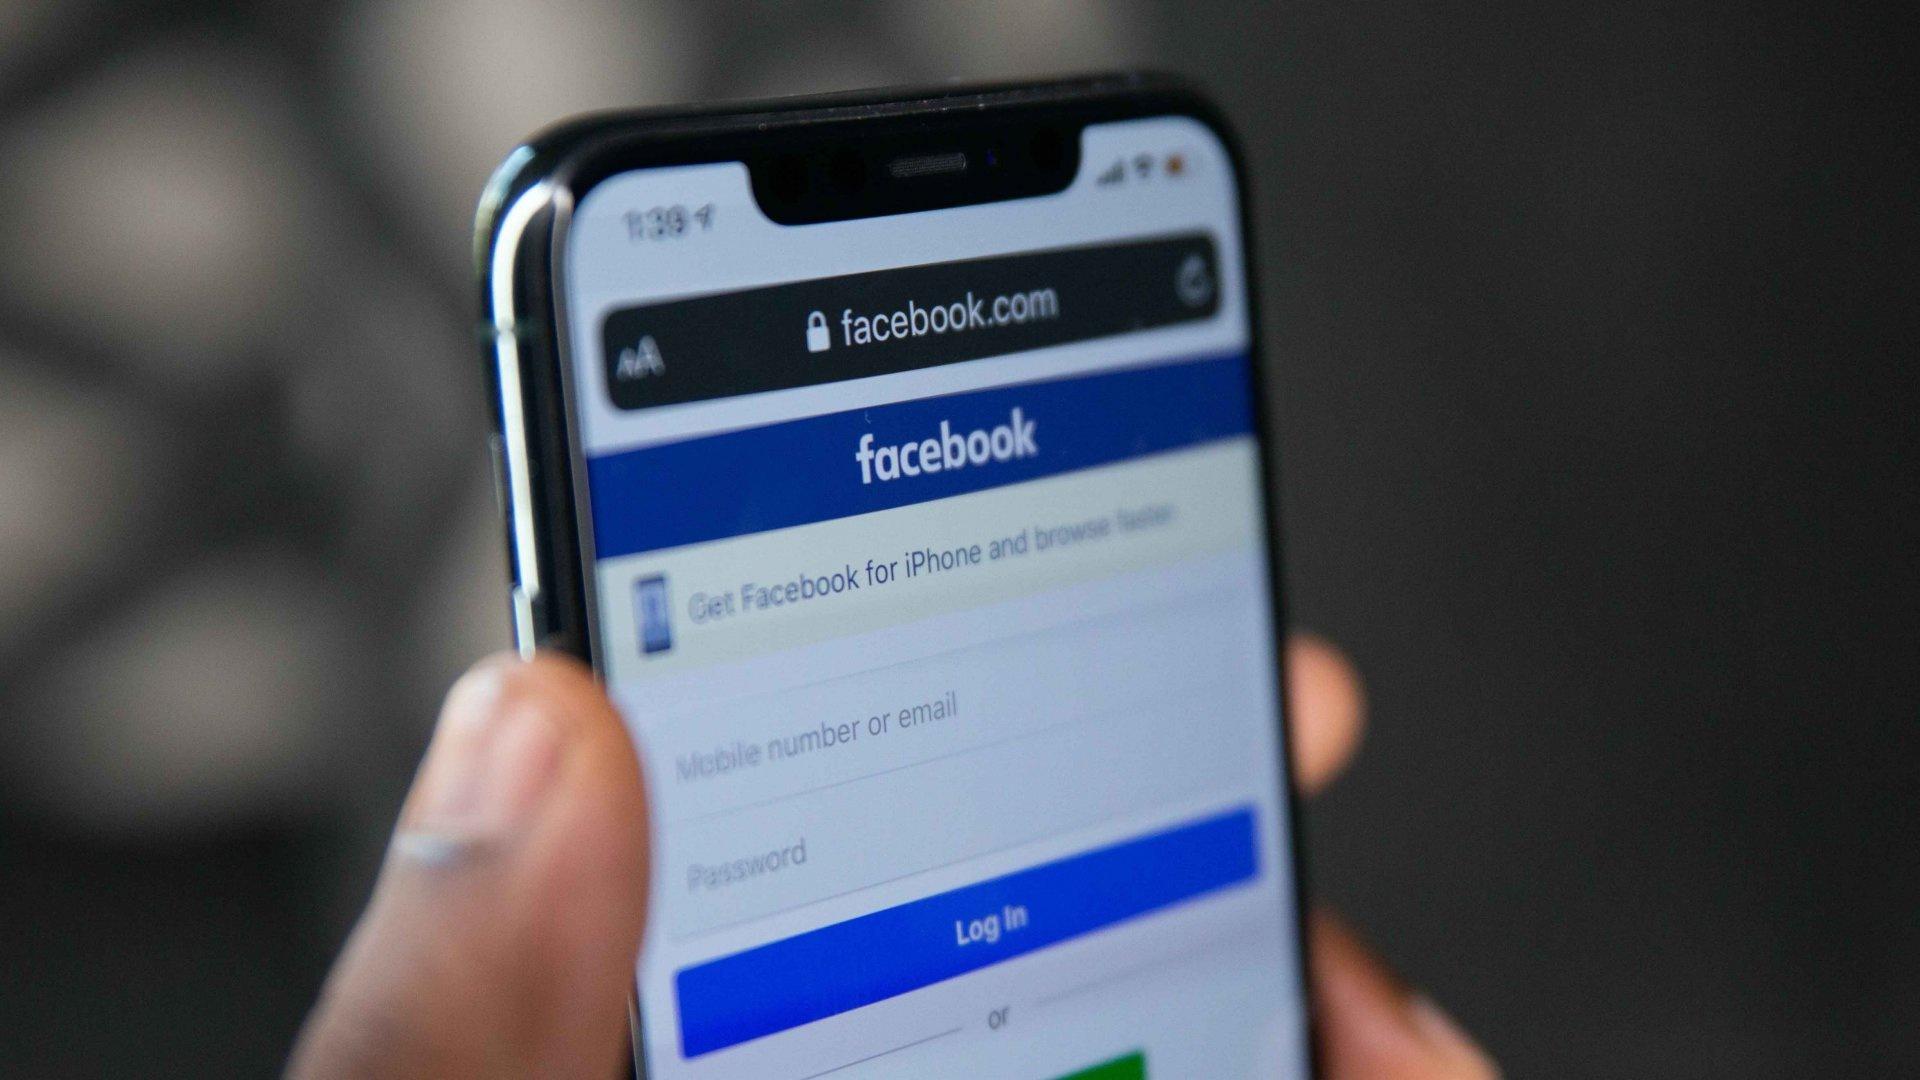 Cuoc chien quang cao Apple-Facebook anh 3